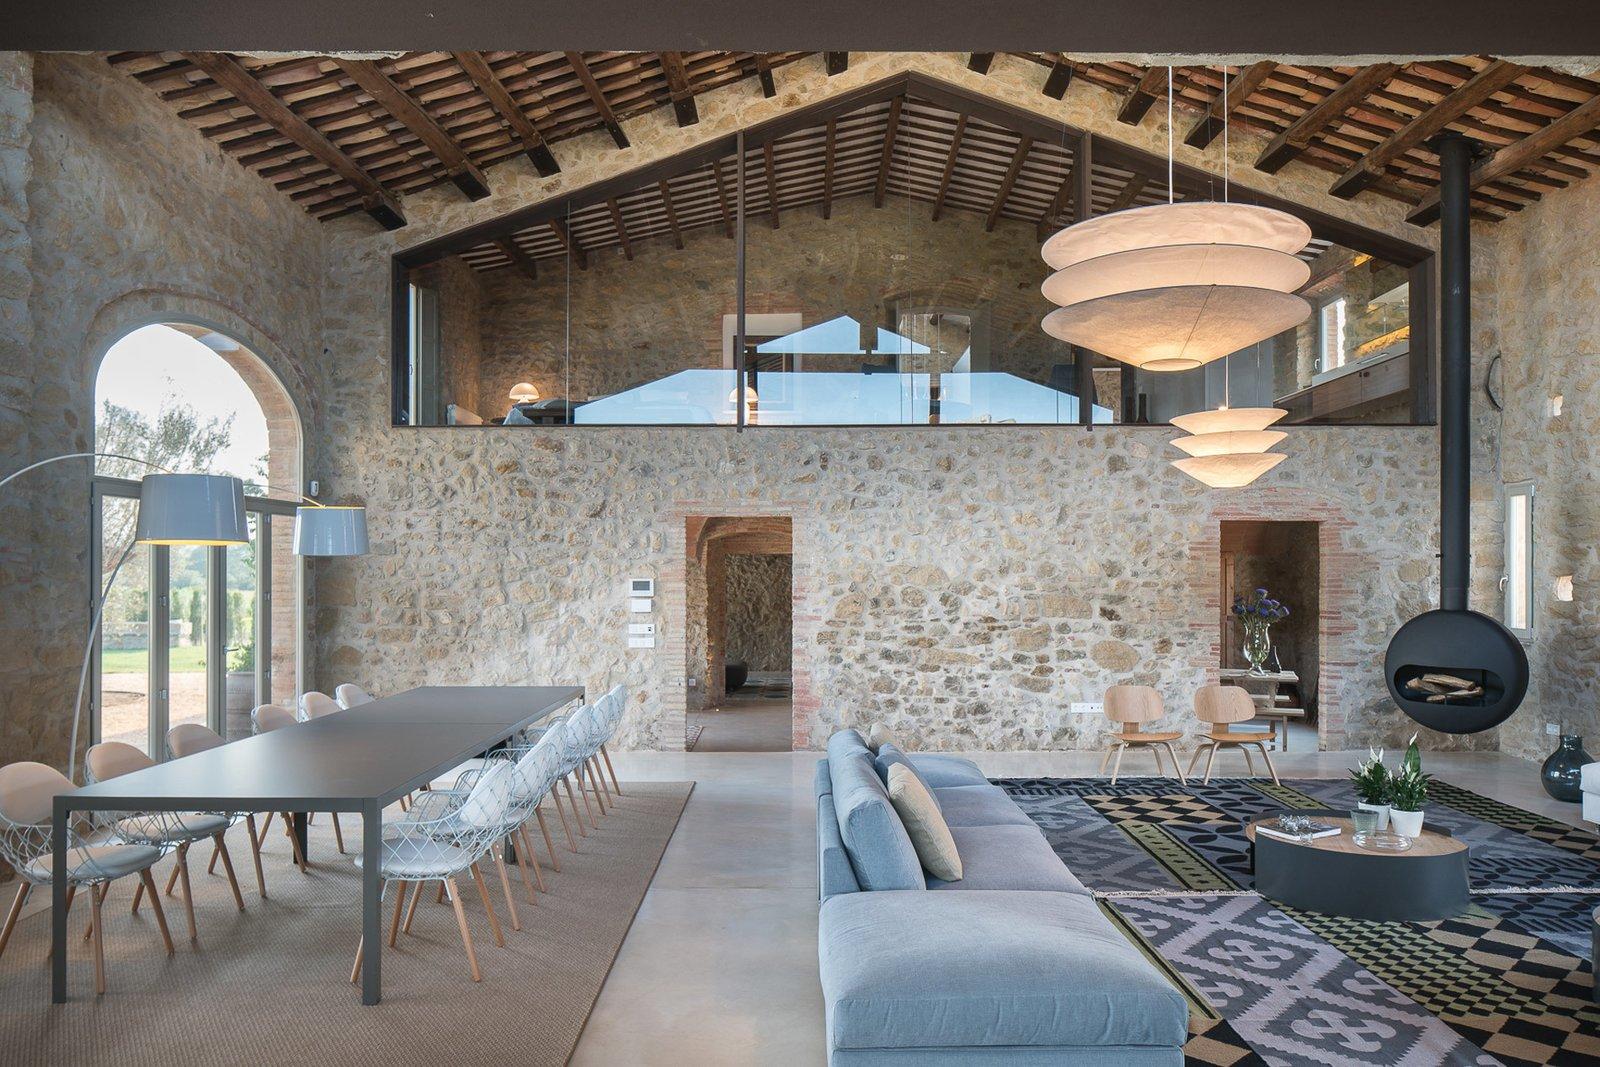 Farmhouse In Girona, Spain - Photo 3 of 14